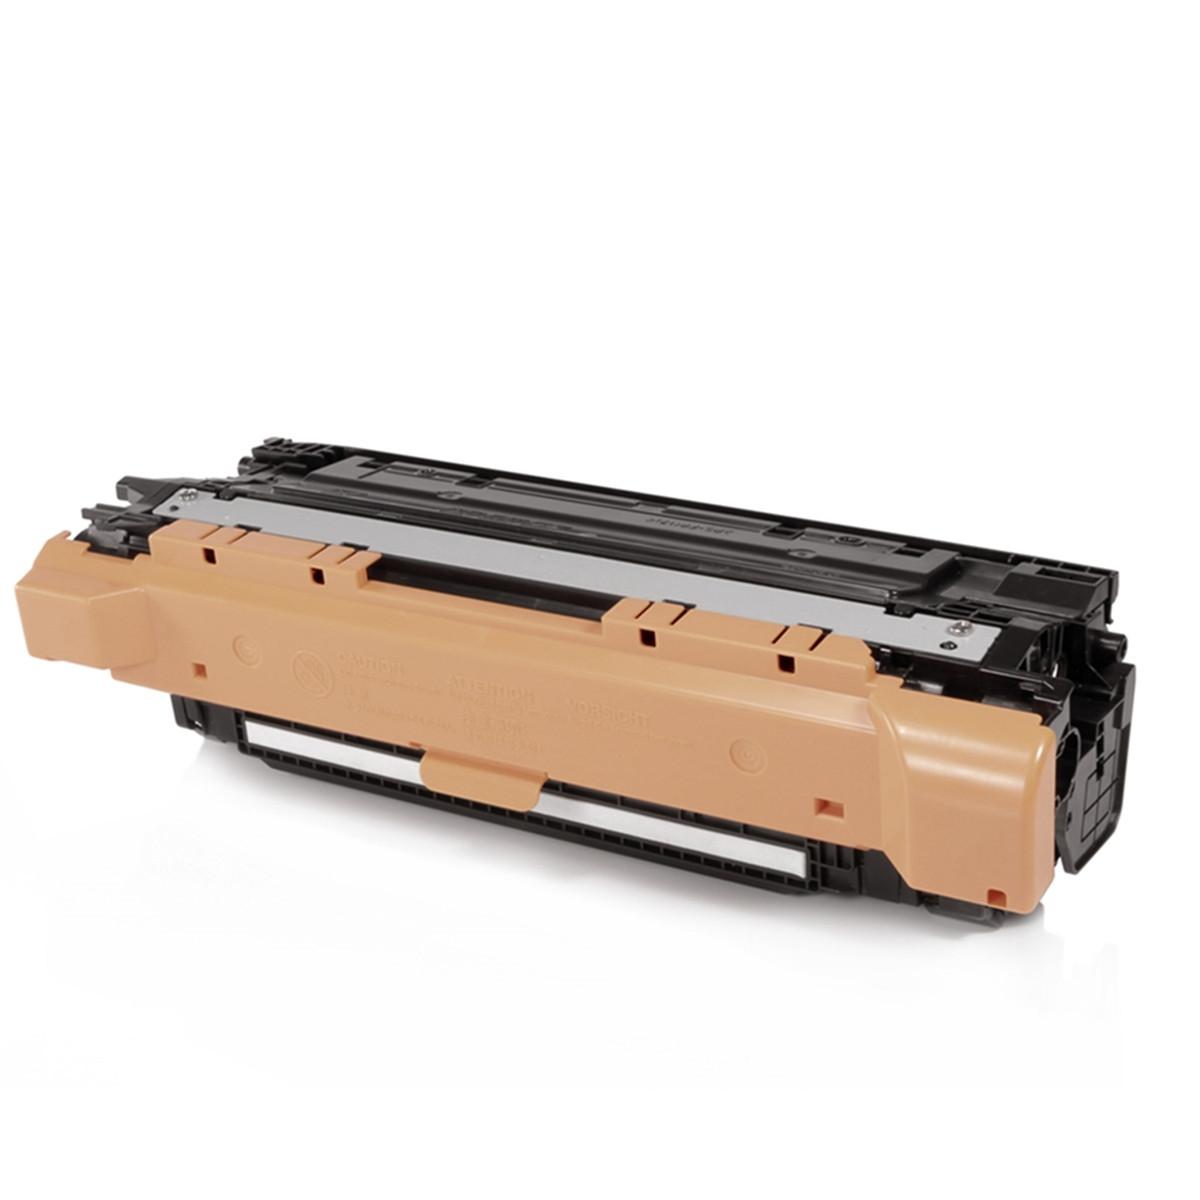 Toner Compatível com HP CE401A Ciano | M575 M570 M551 M575DN M575F M575C M570DN M570DW Importado 6k